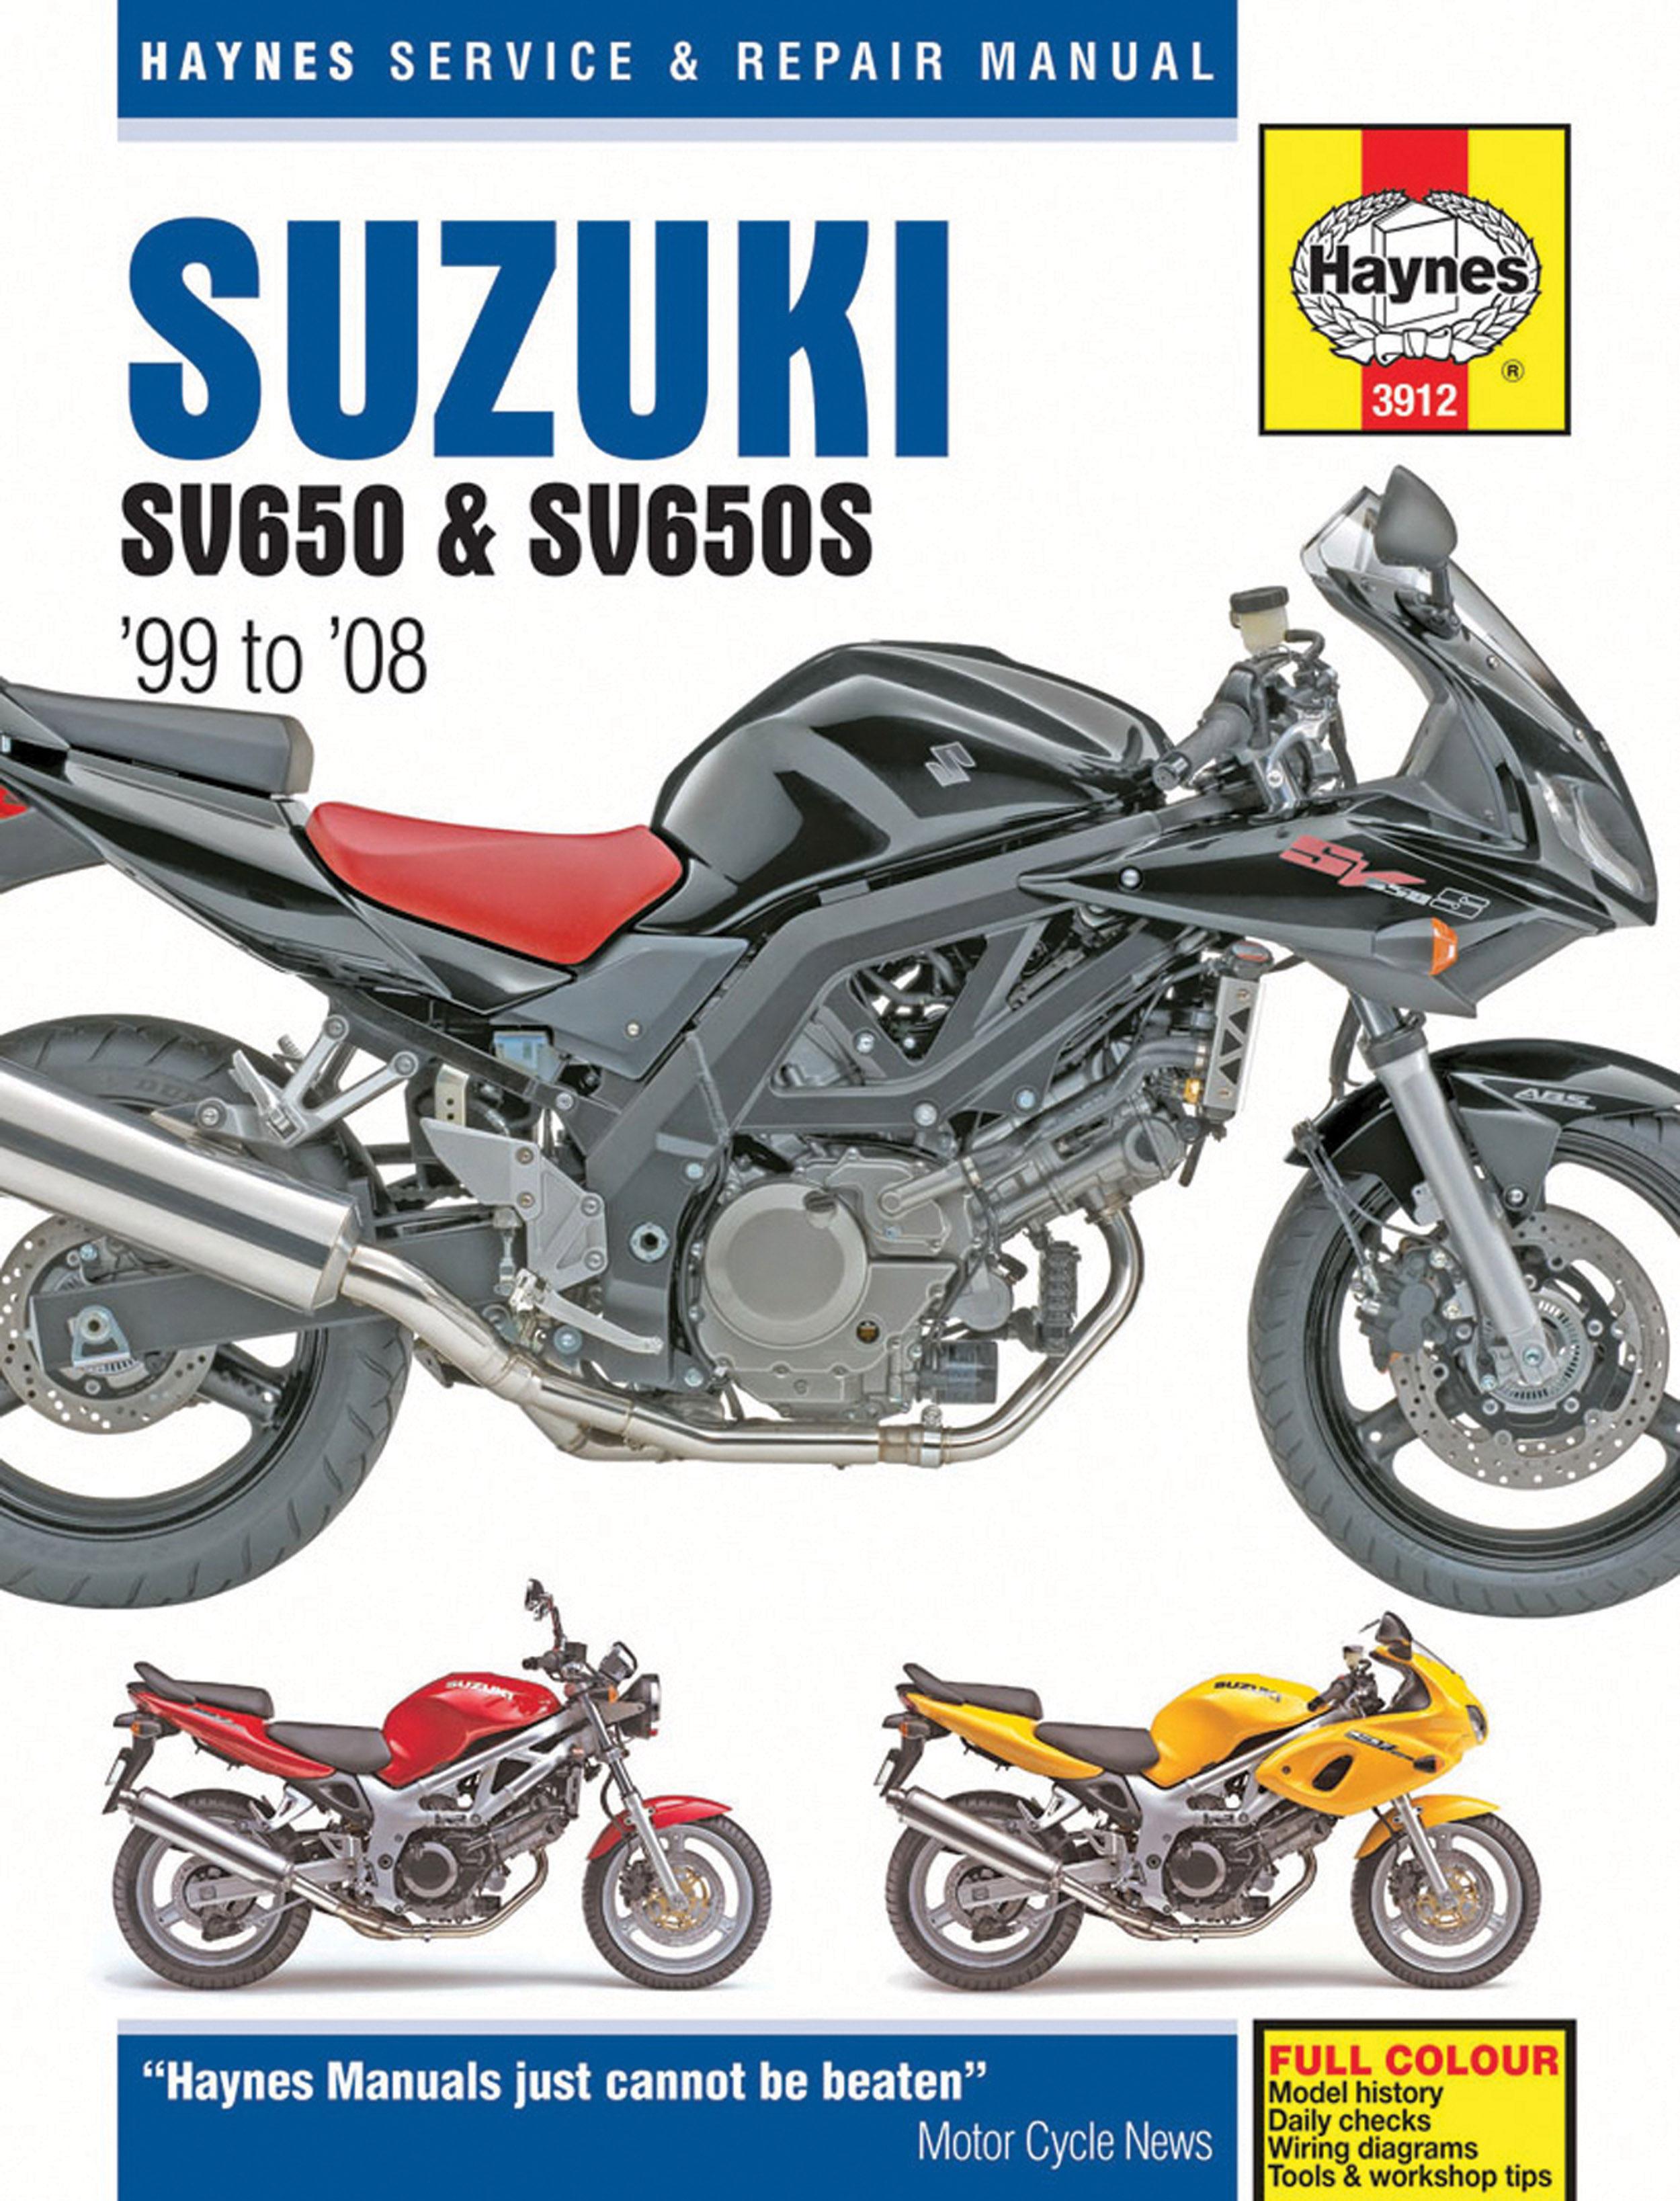 haynes repair manual suzuki sv650, sv650s, sv650sa, and sv650a (1999 2008) sv650 spark plug 2008 sv650 wiring diagram #15